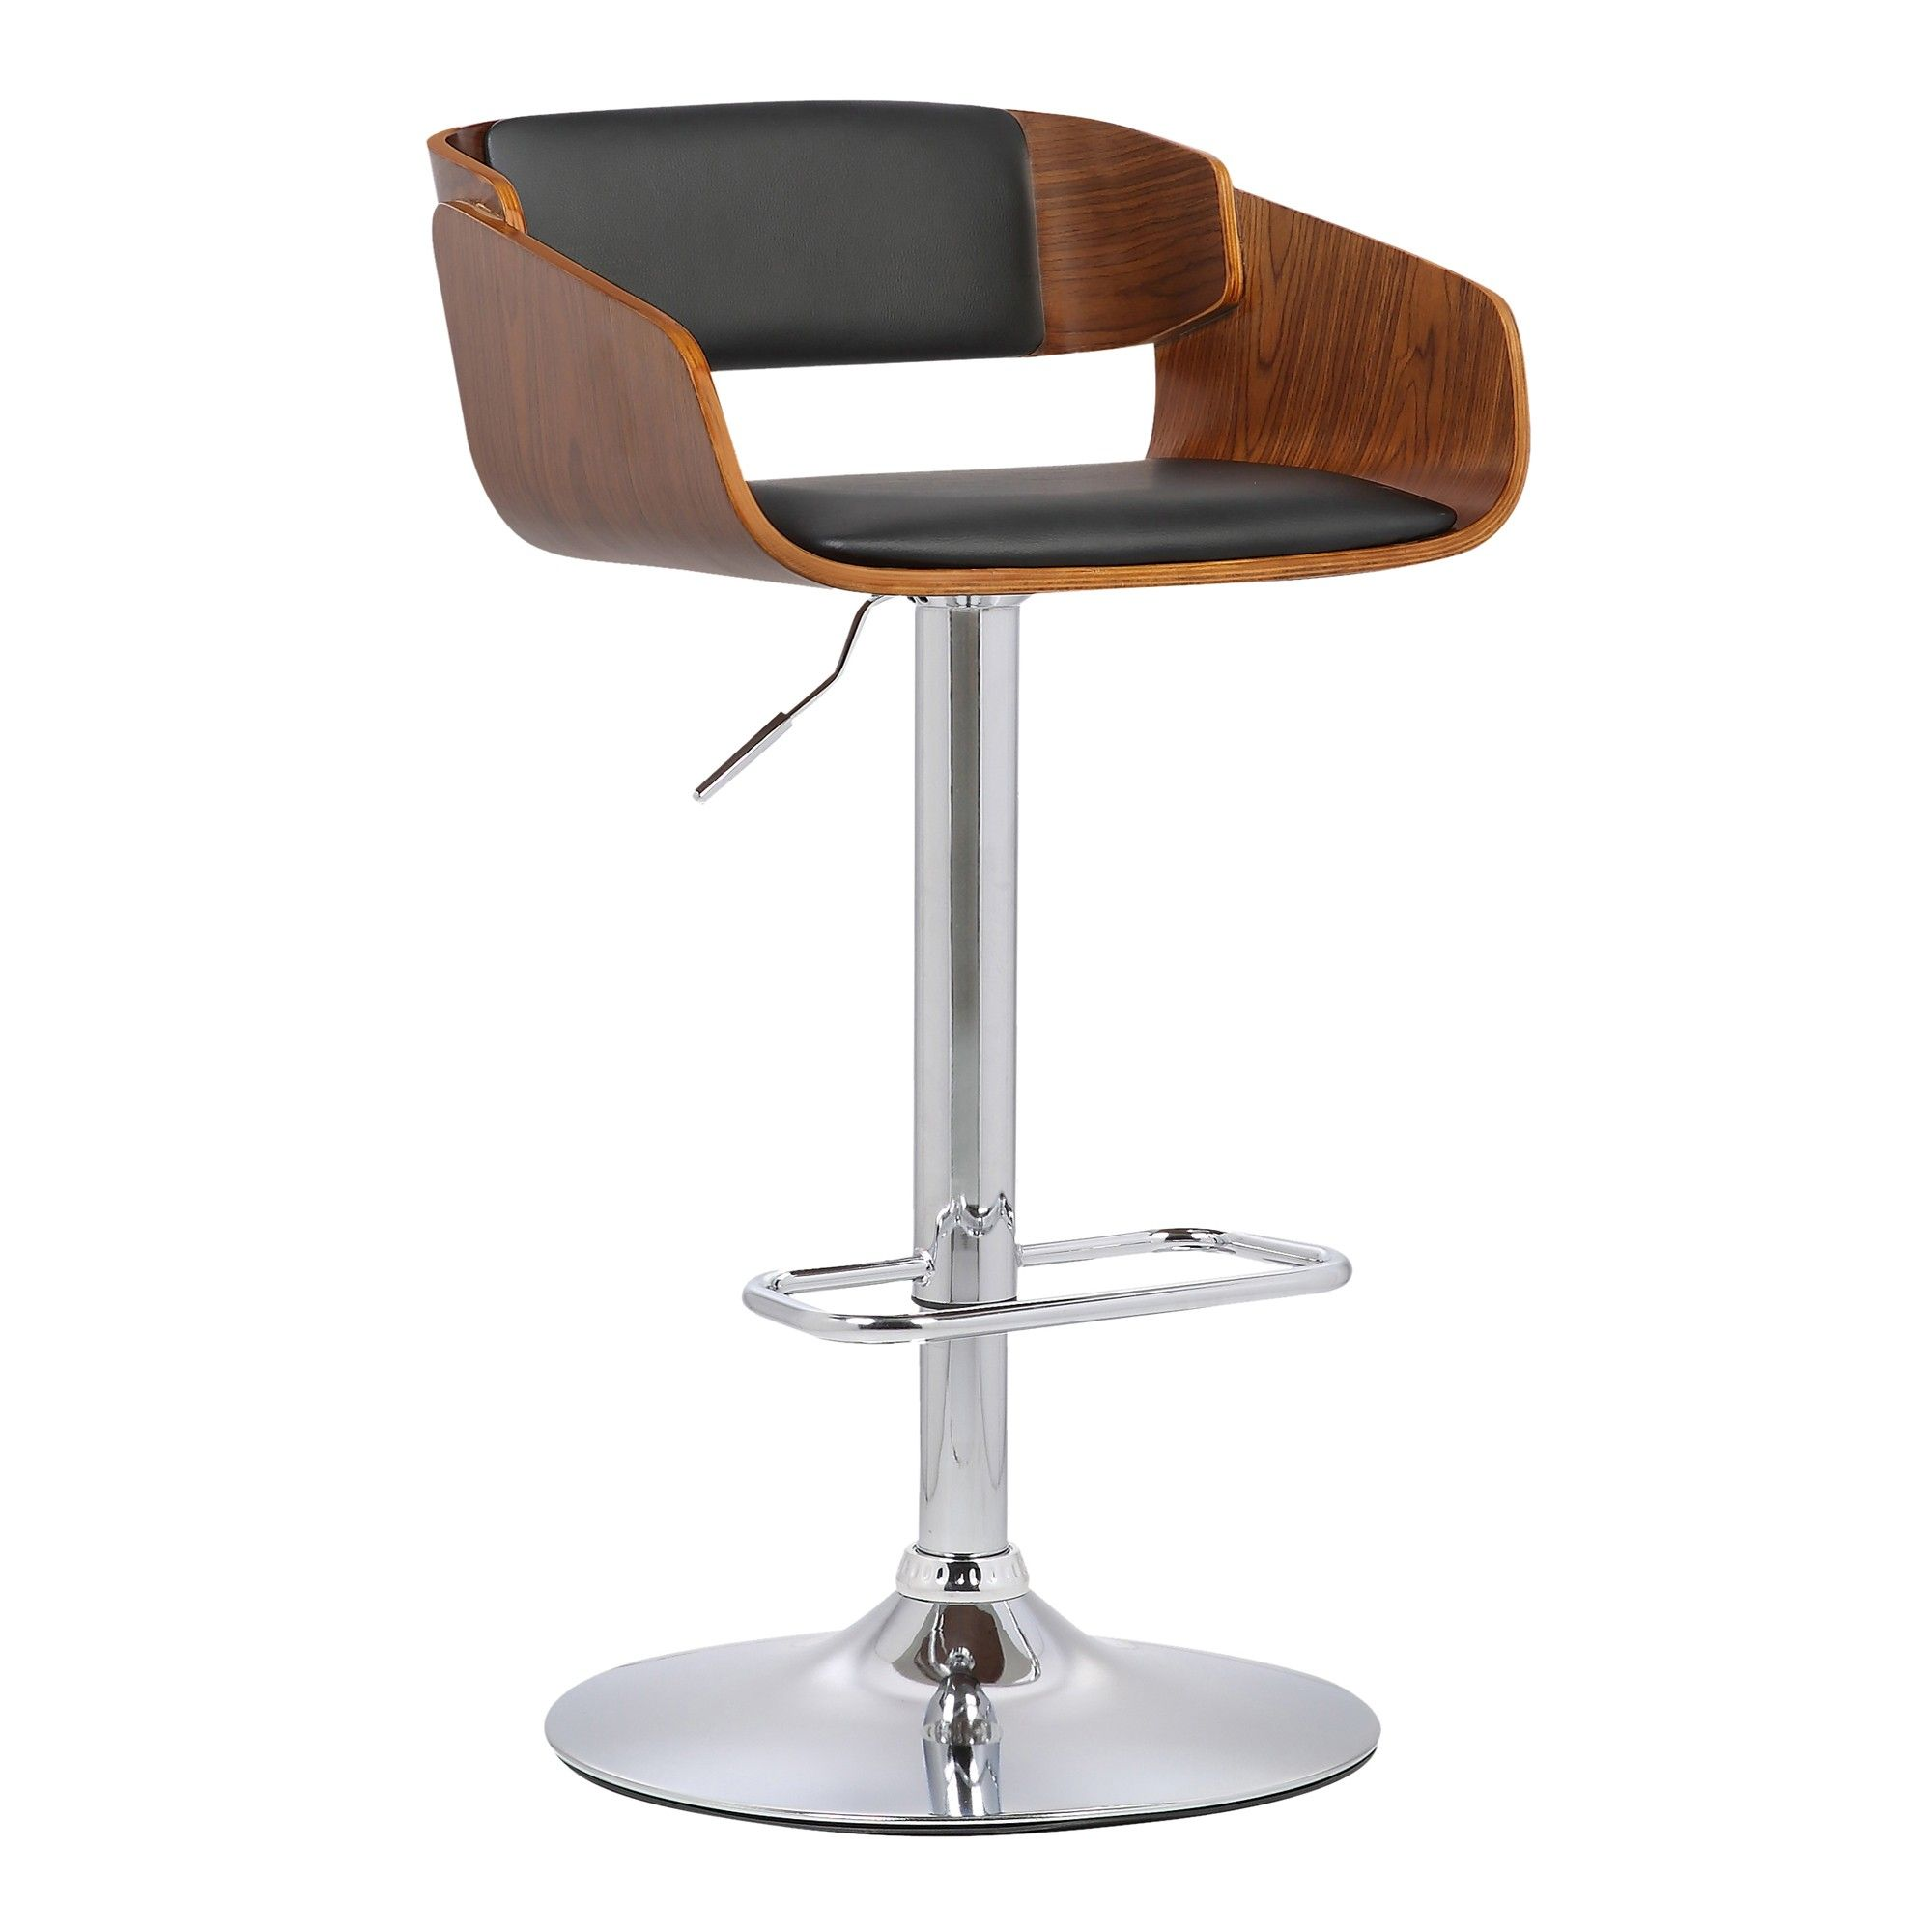 Swell Jenny Mid Century Adjustable Swivel Barstool In Chrome Ncnpc Chair Design For Home Ncnpcorg